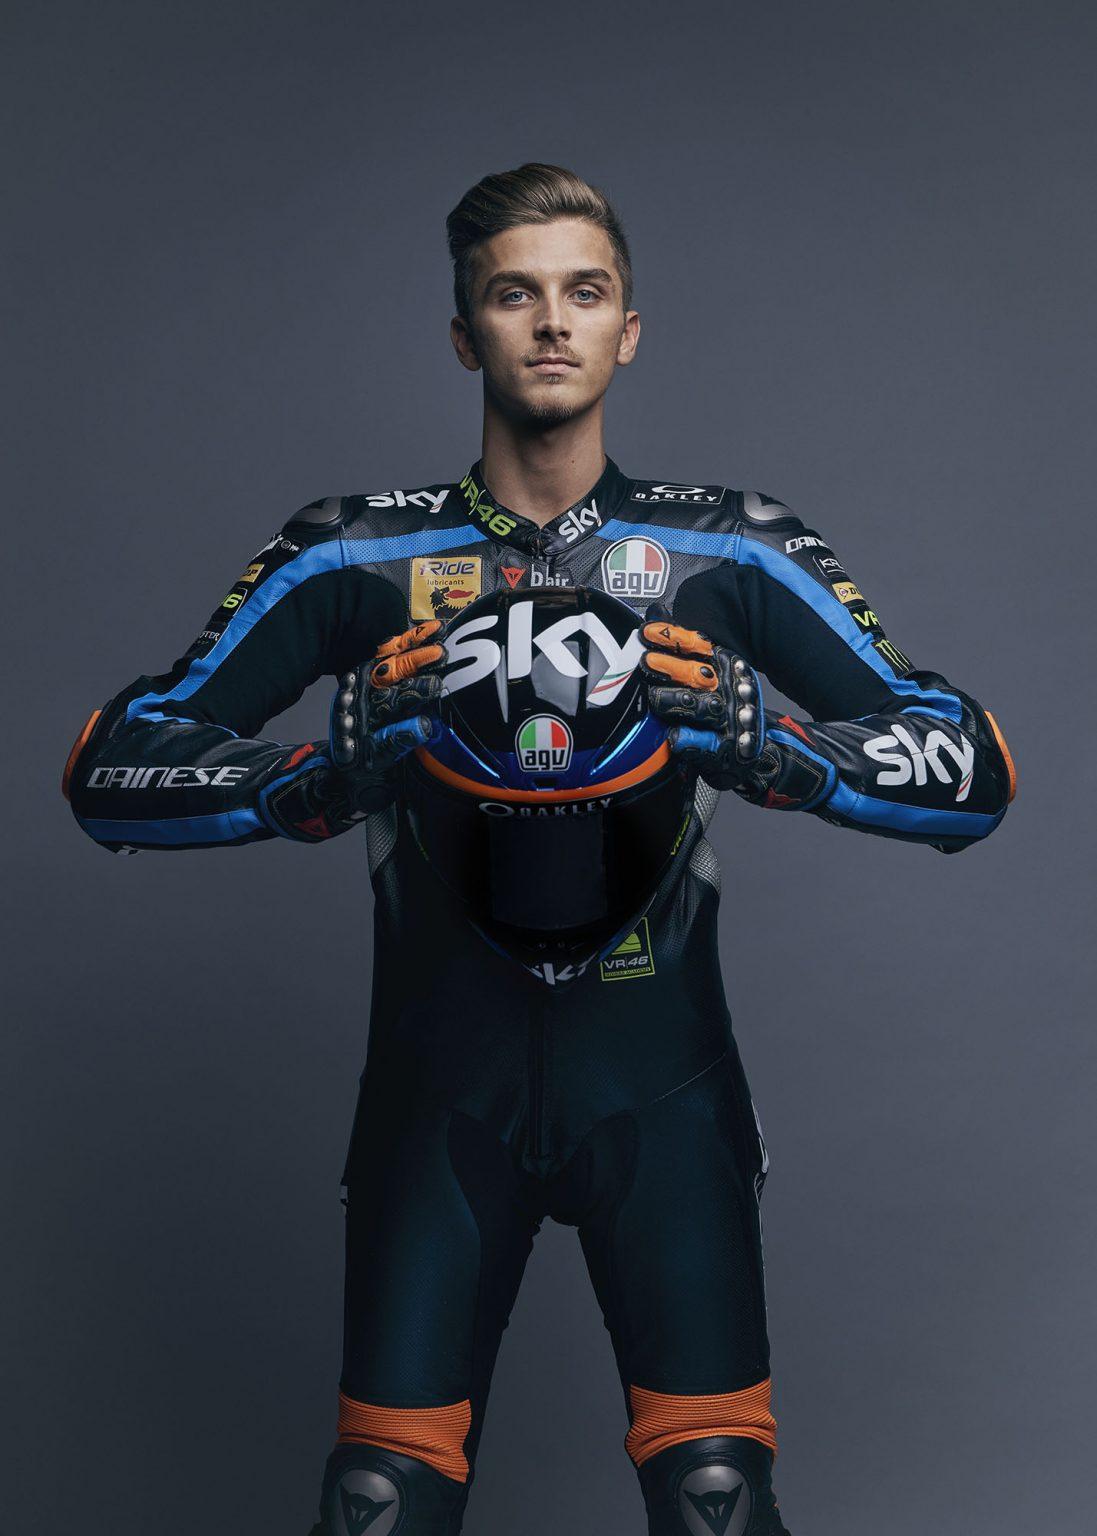 Milan, January 2019 - Luca Marini, Sky Racing Team VR46 motobiker. >< Milano, gennaio 2019 - Luca Marini, pilota della squadra di motociclismo Sky Racing Team VR46.